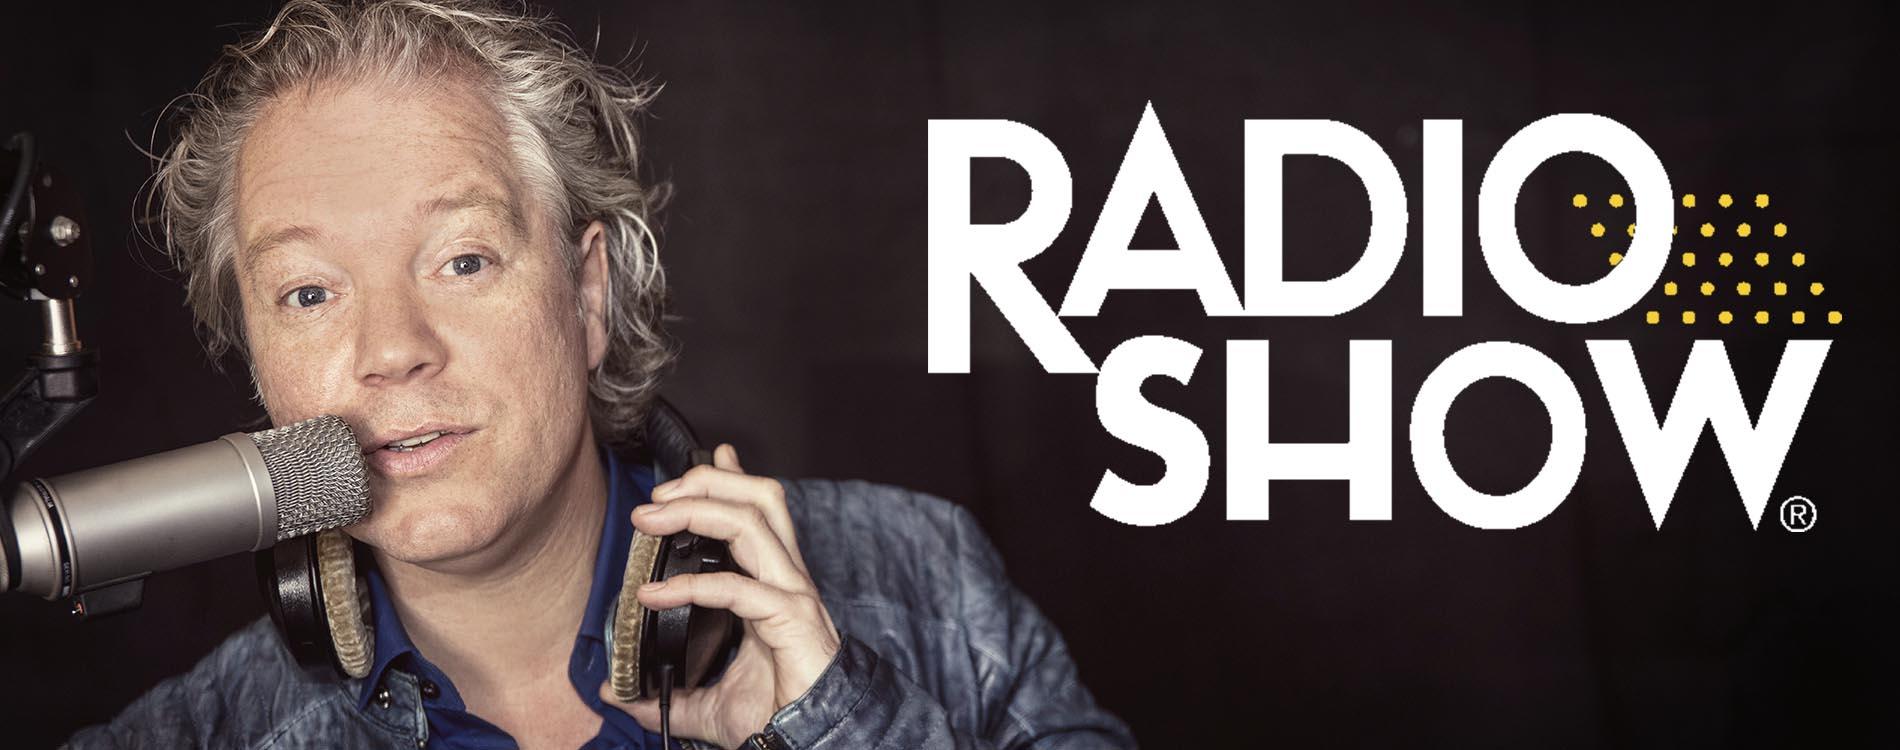 Header Radio Show